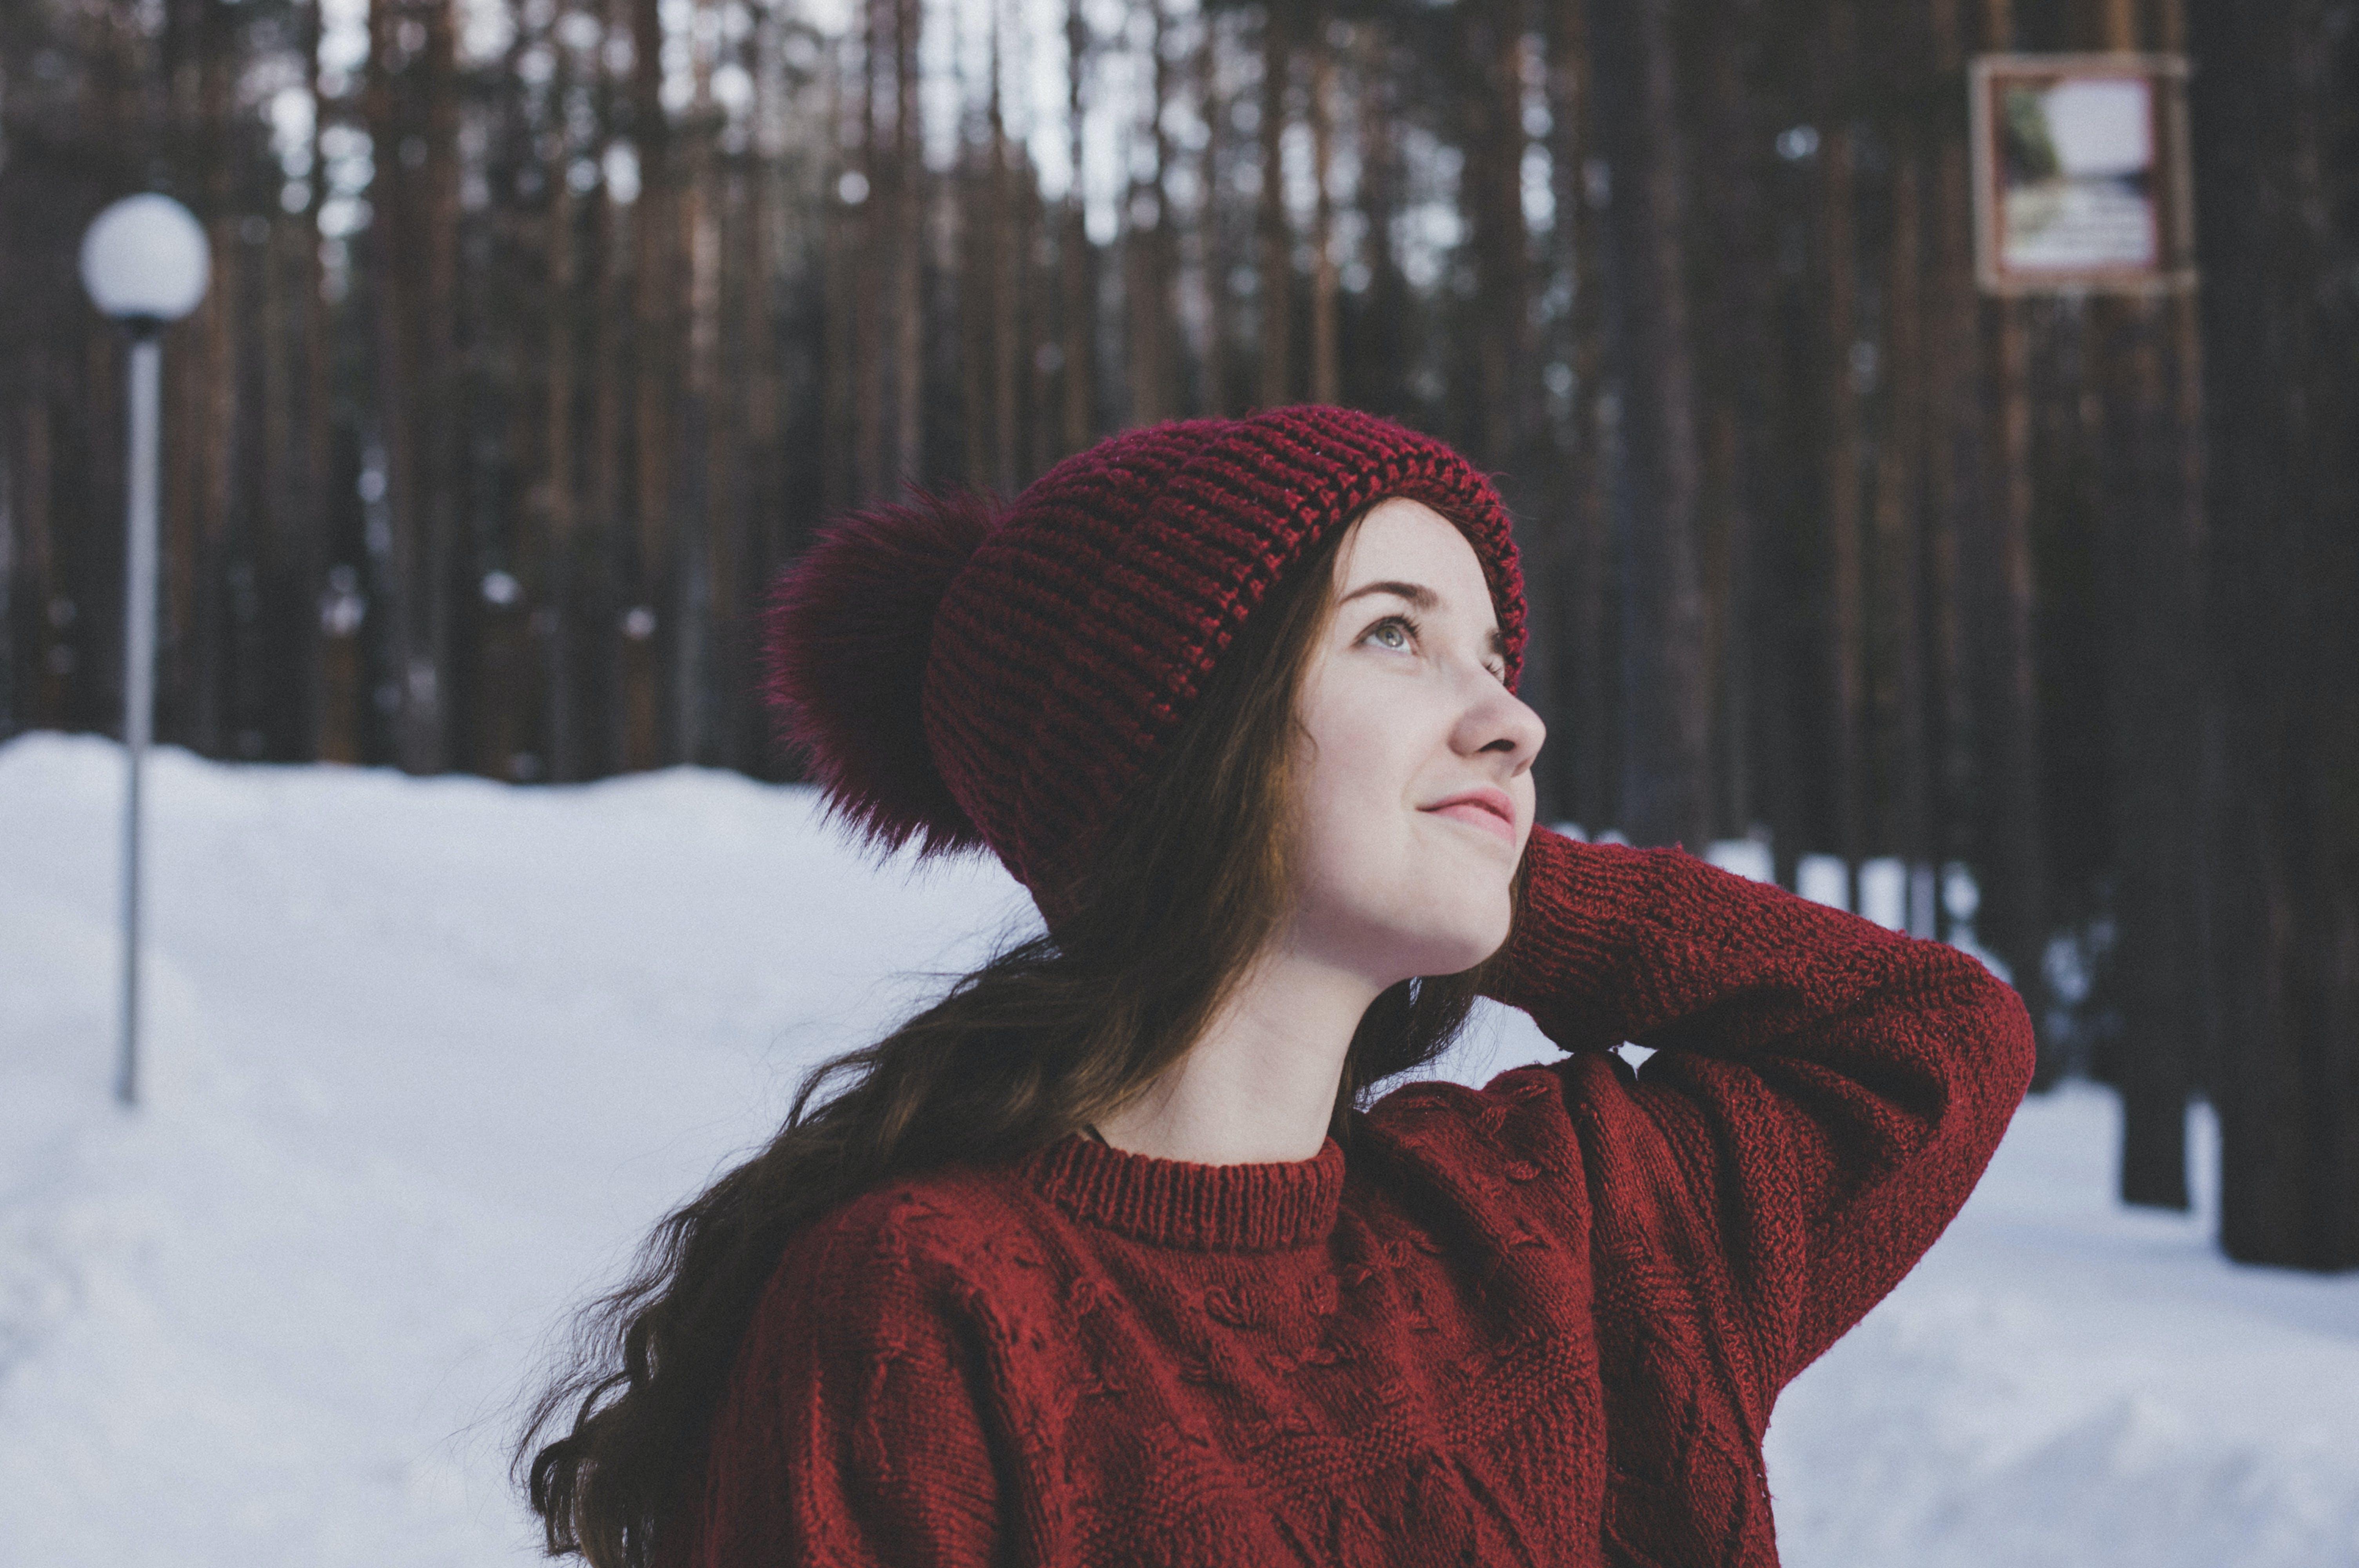 Woman Wearing Maroon Bobble Beanie on Winter Day